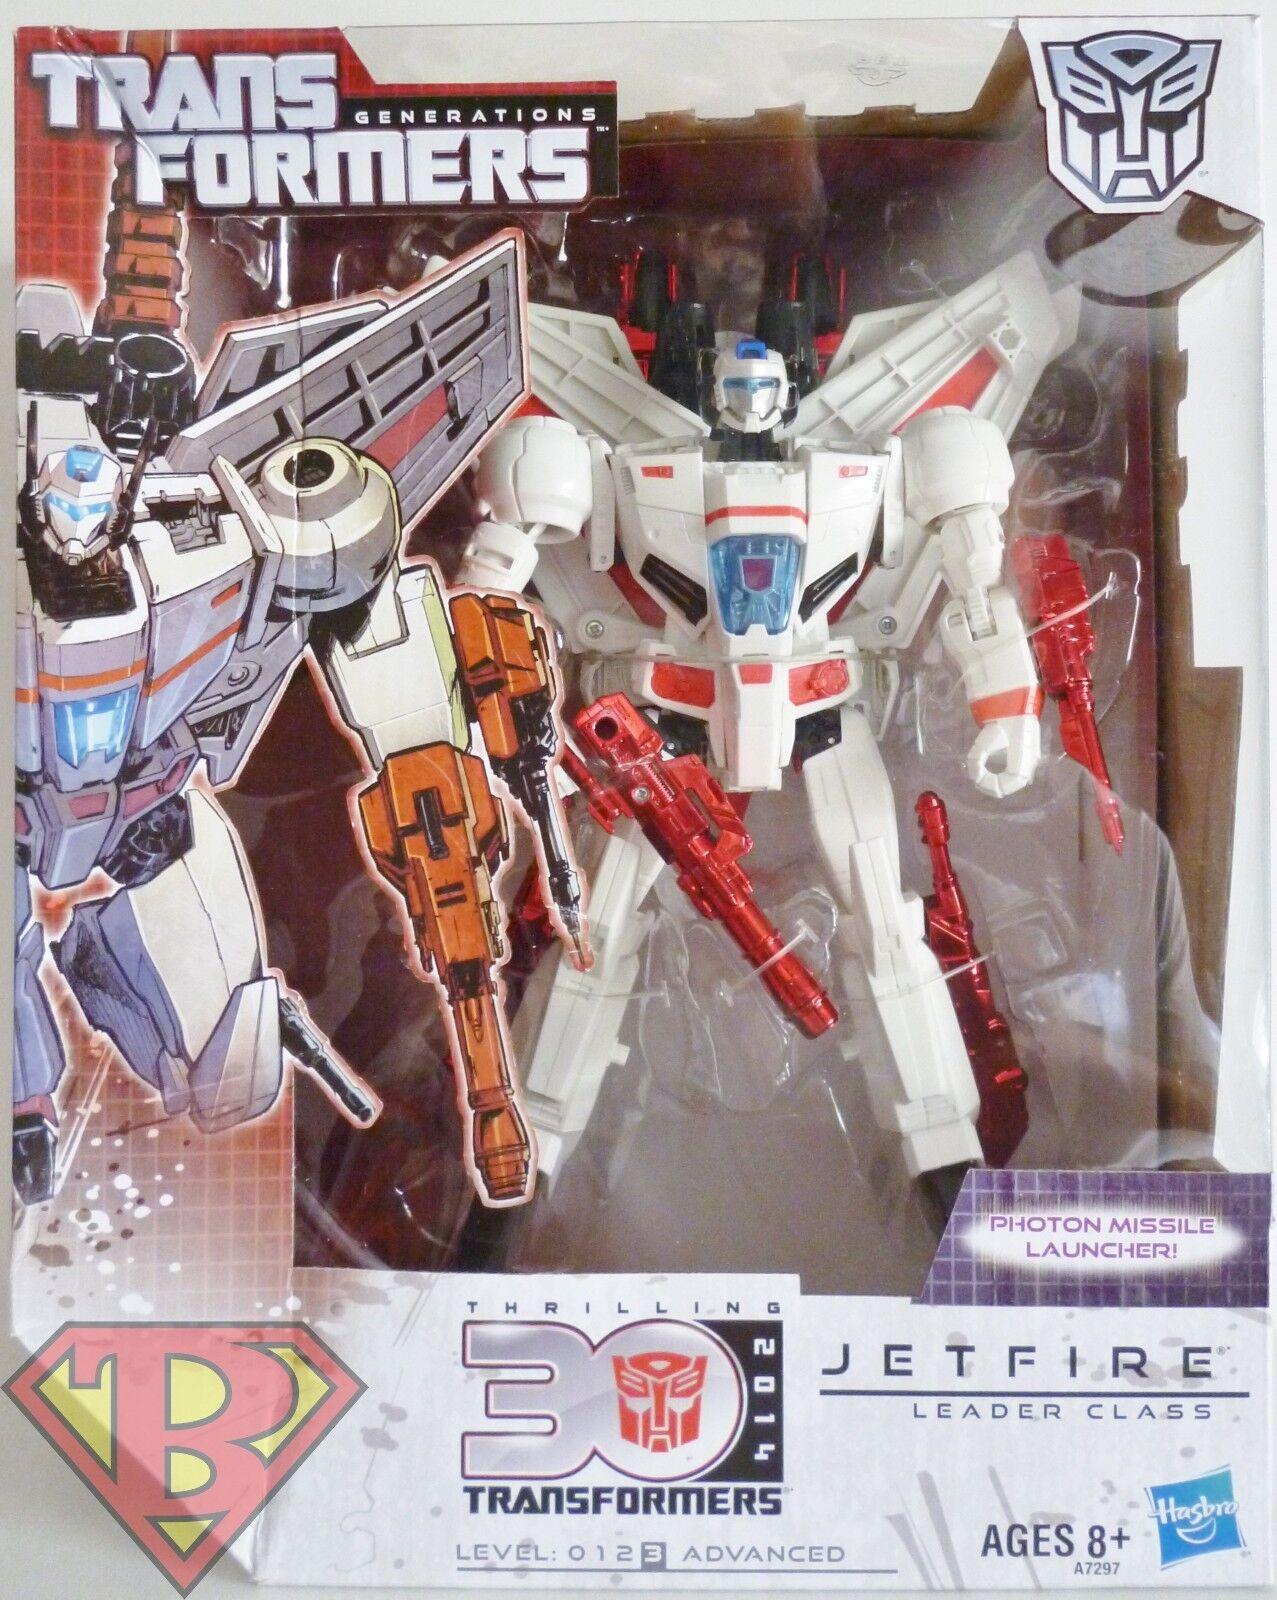 JETFIRE Transformers Generations 30th Anniversary Leader Class Autobot 2014